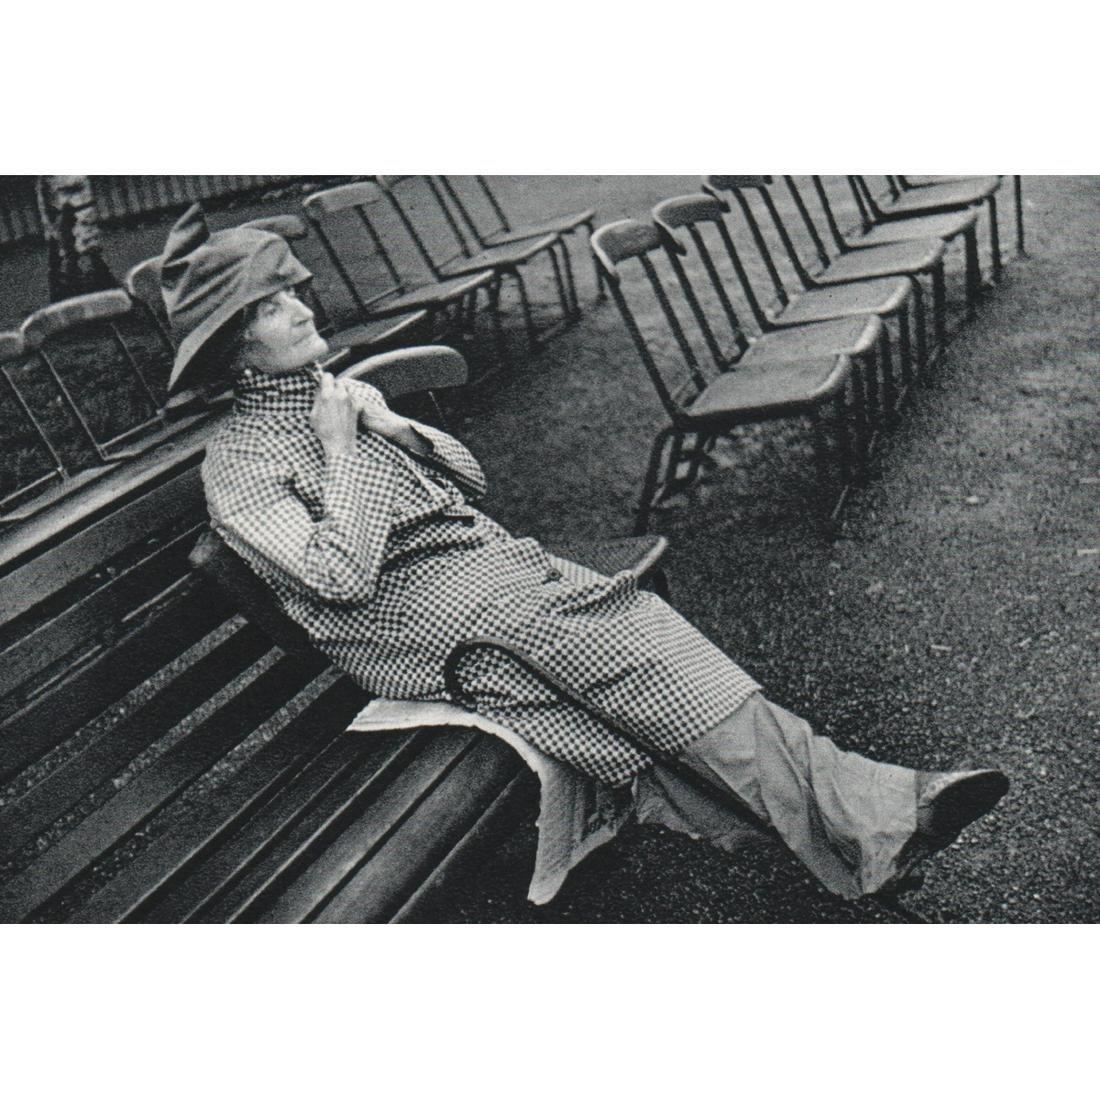 HENRI CARTIER-BRESSON - London, 1938